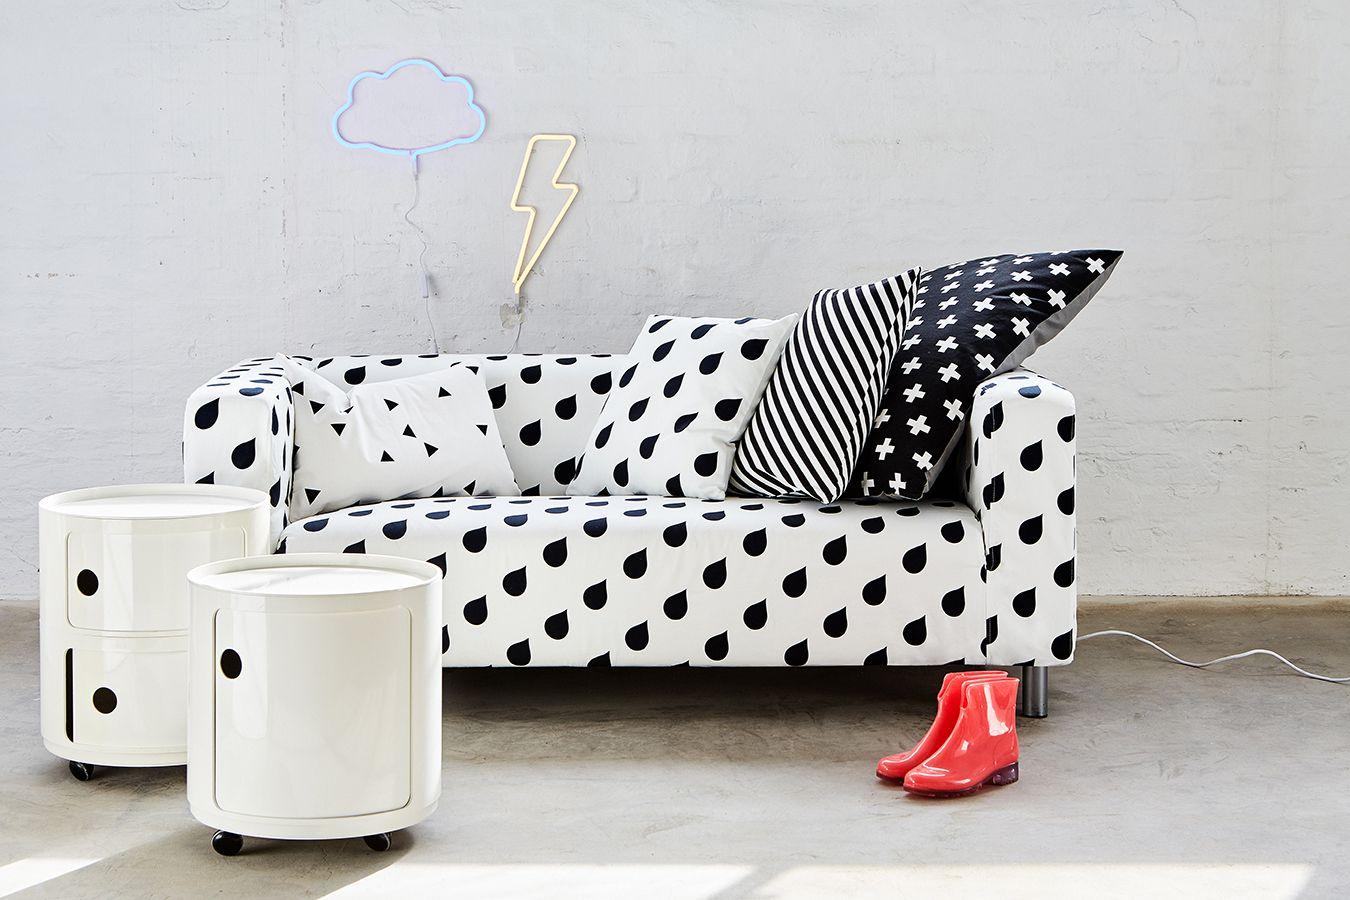 Ikea Klippan Cover Water Drops Cushions On Sofa Black White